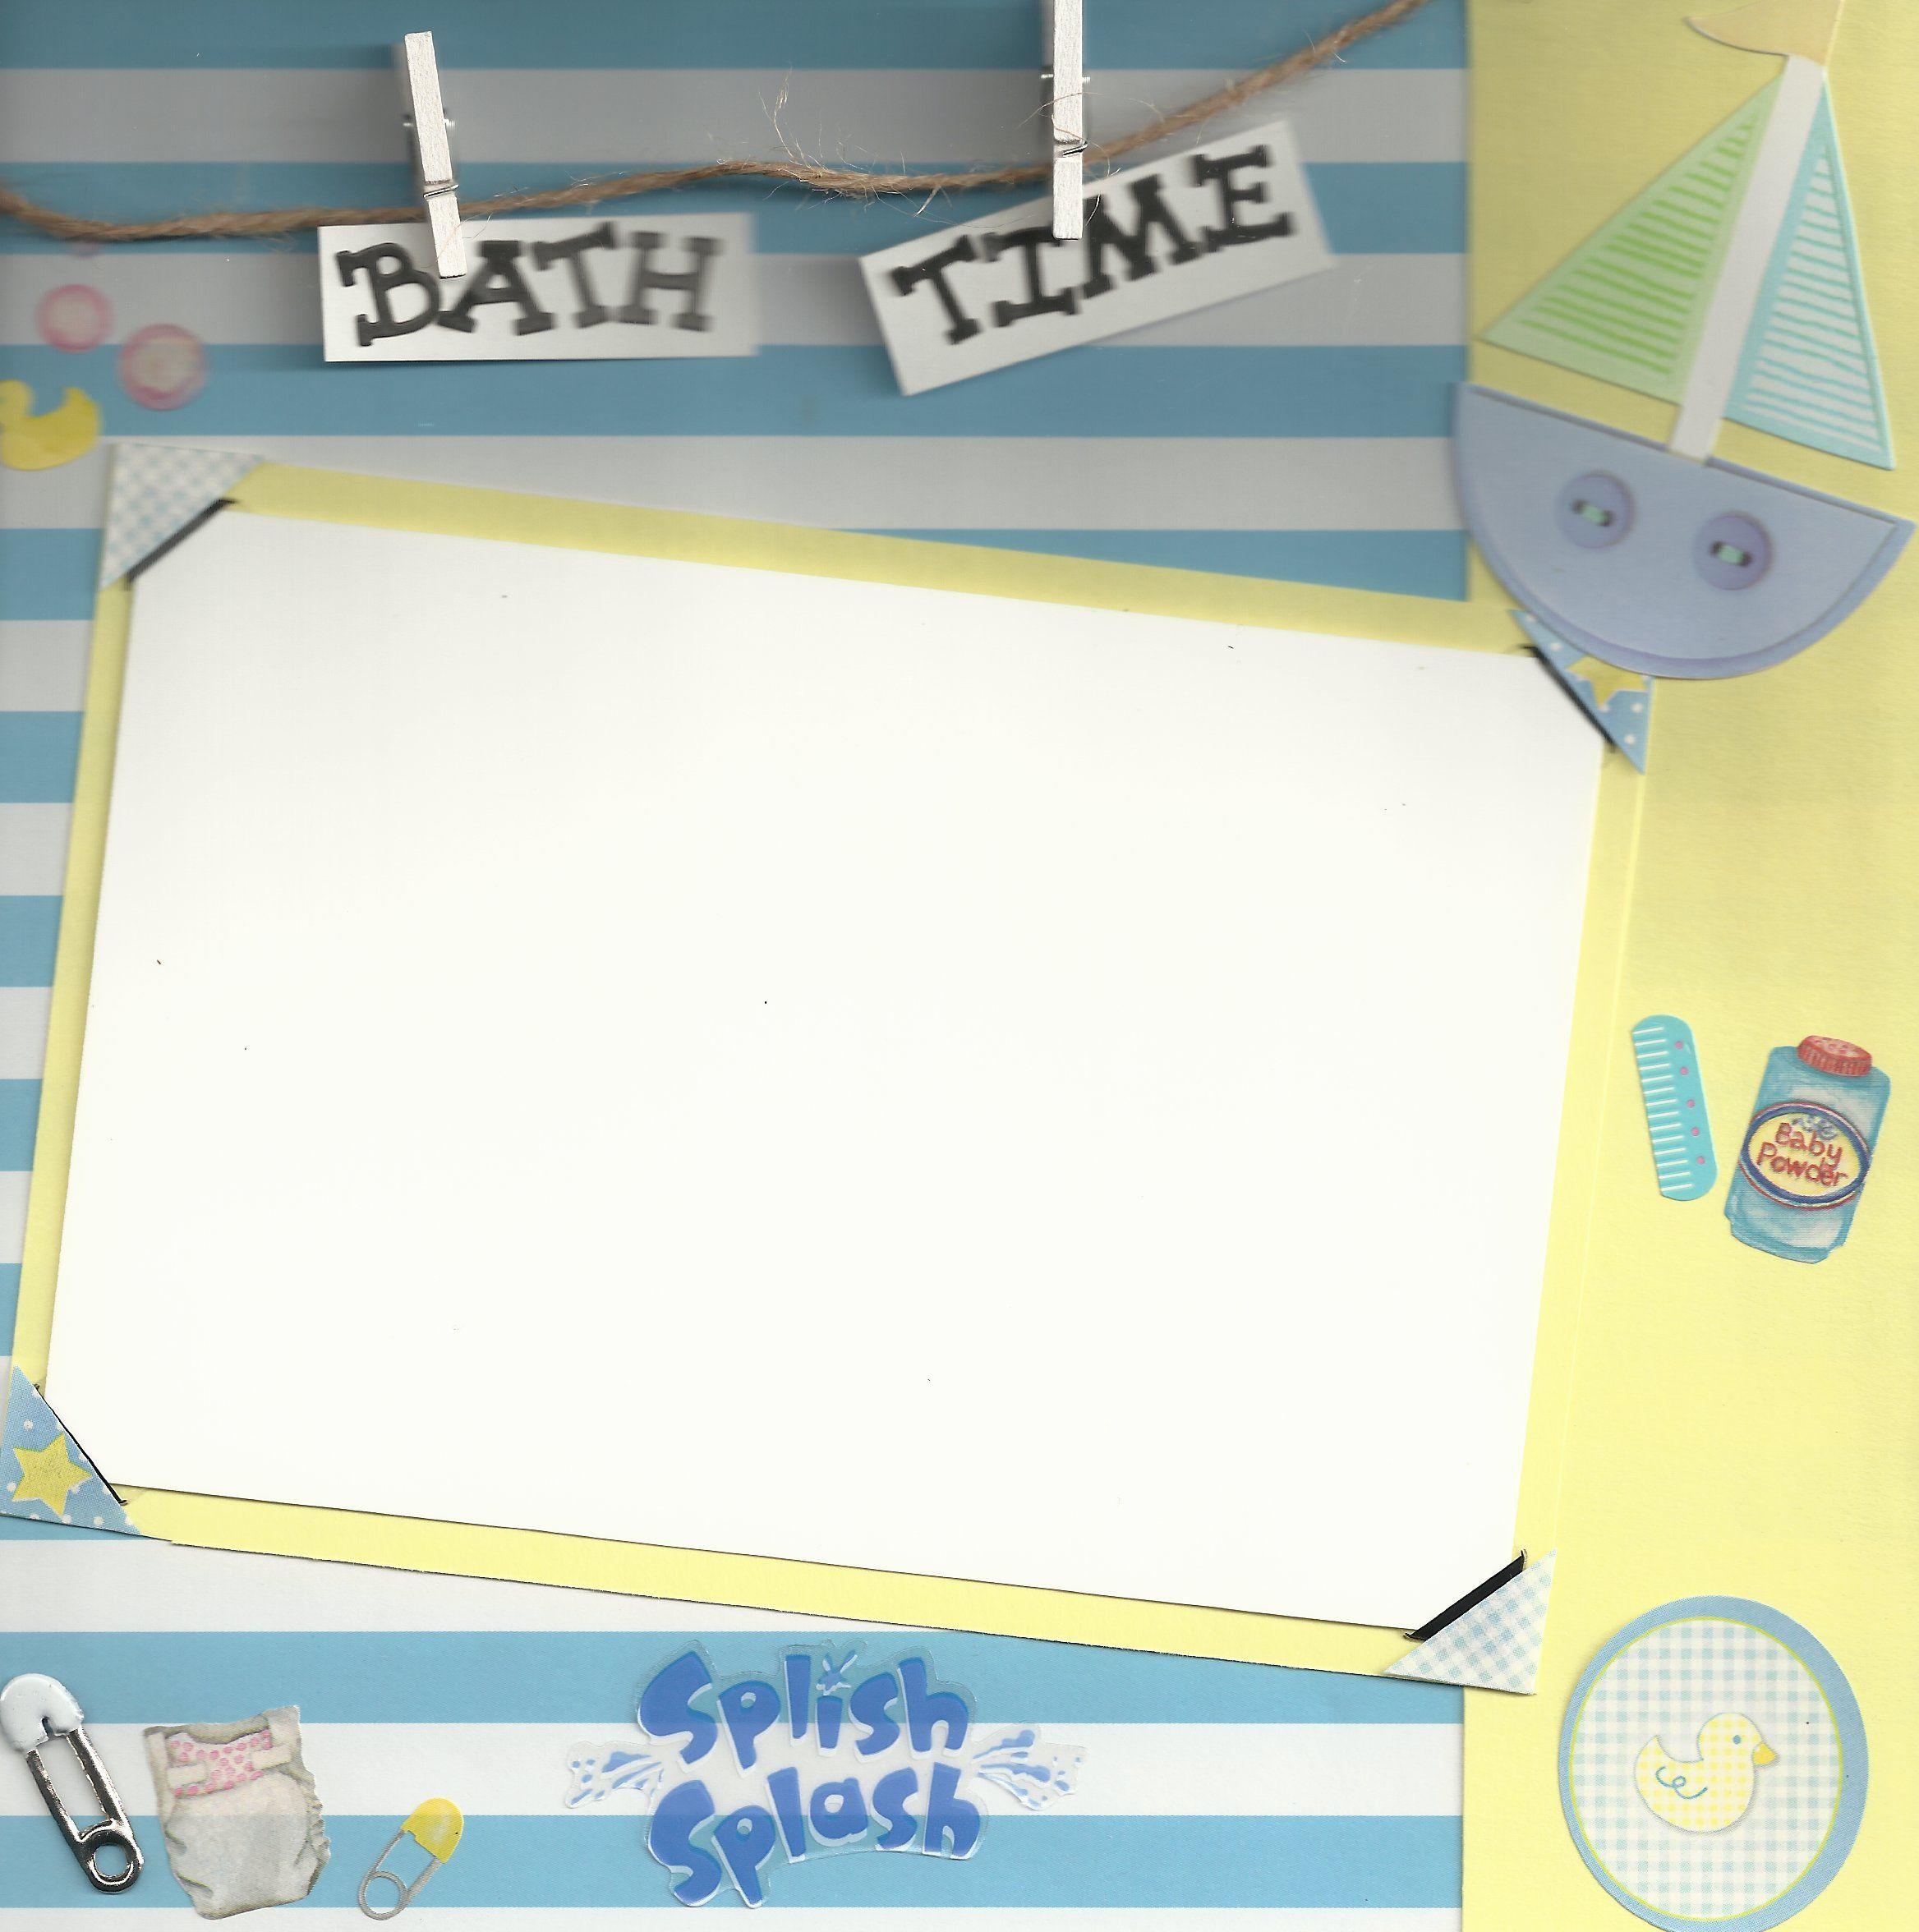 Baby scrapbook page ideas - Baby Scrapbook Page Ideas 8x8 Pages Bath Time